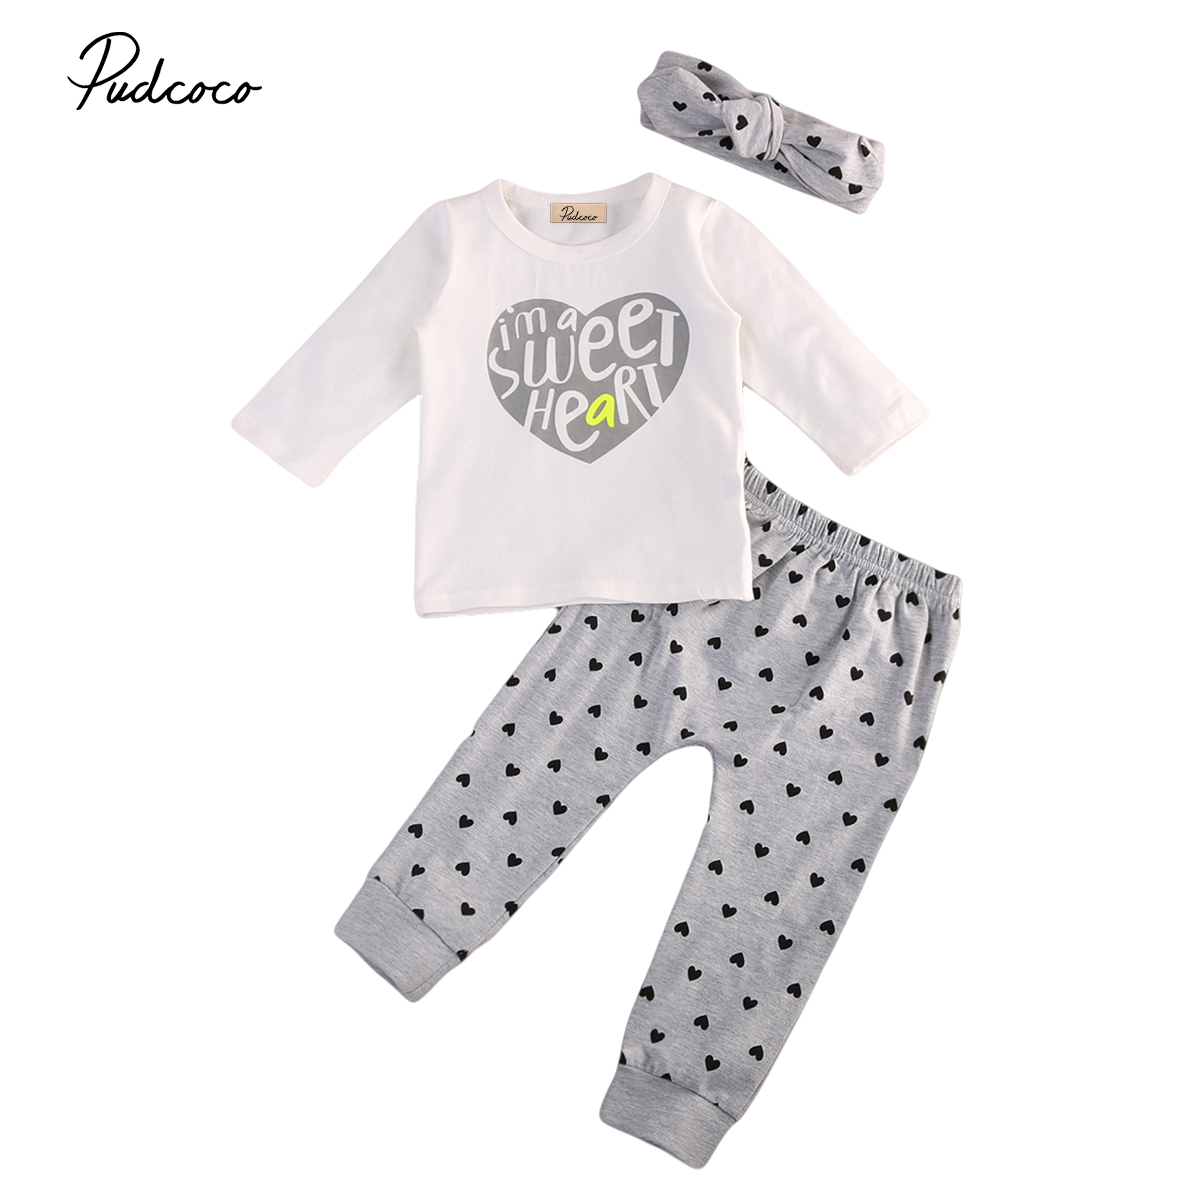 Cotton Newborn Baby Girl Heart Print Tops Long Sleeve T-shirt Leggings Pants 3PCS Outfit Set Winter Autumn Girls Clothes